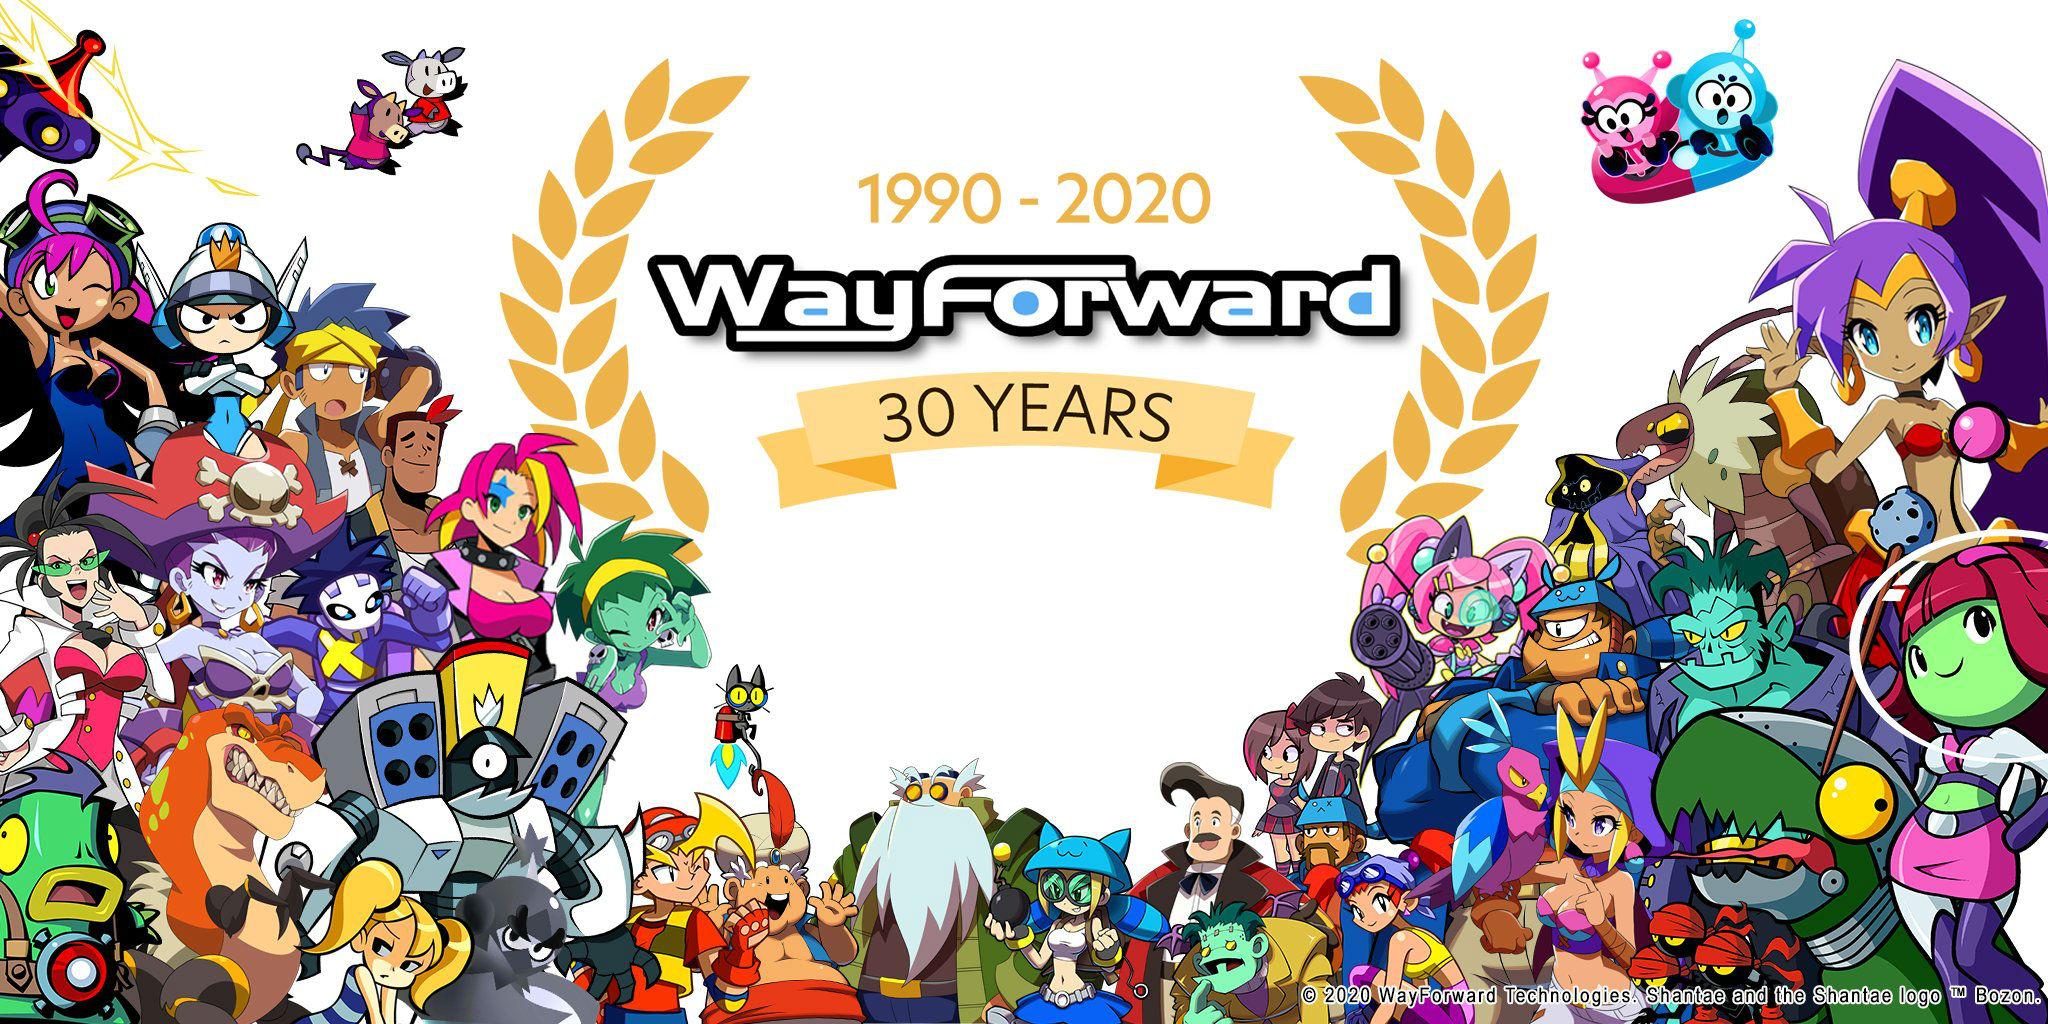 WayForward turns 30 today, celebrates nearly 20 years of Shantae screenshot